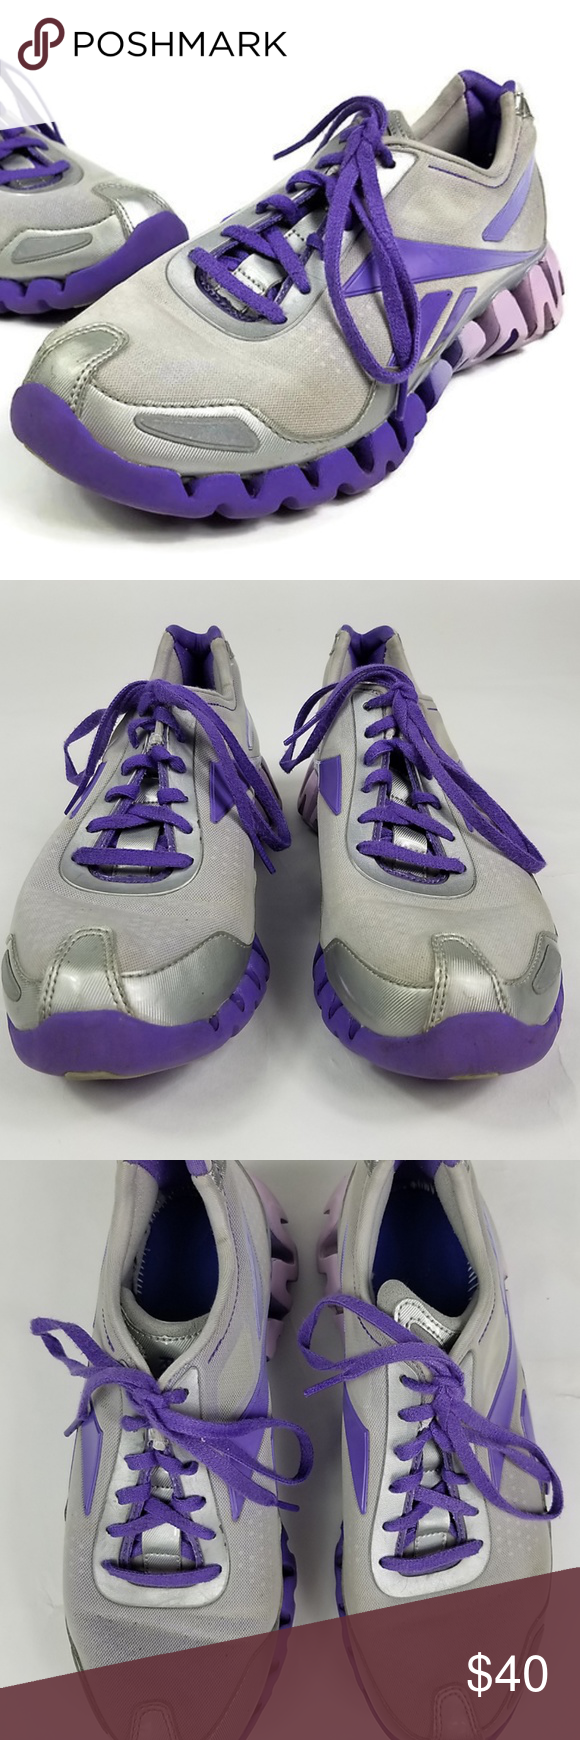 06f40ca836e75 Reebok ZIG ZAG Running Cross Training Shoes 8.5 Reebok Womens ZIG ZAG  Gray Purple Running Cross Training Shoes Size 8.5 Reebok Shoes Athletic  Shoes